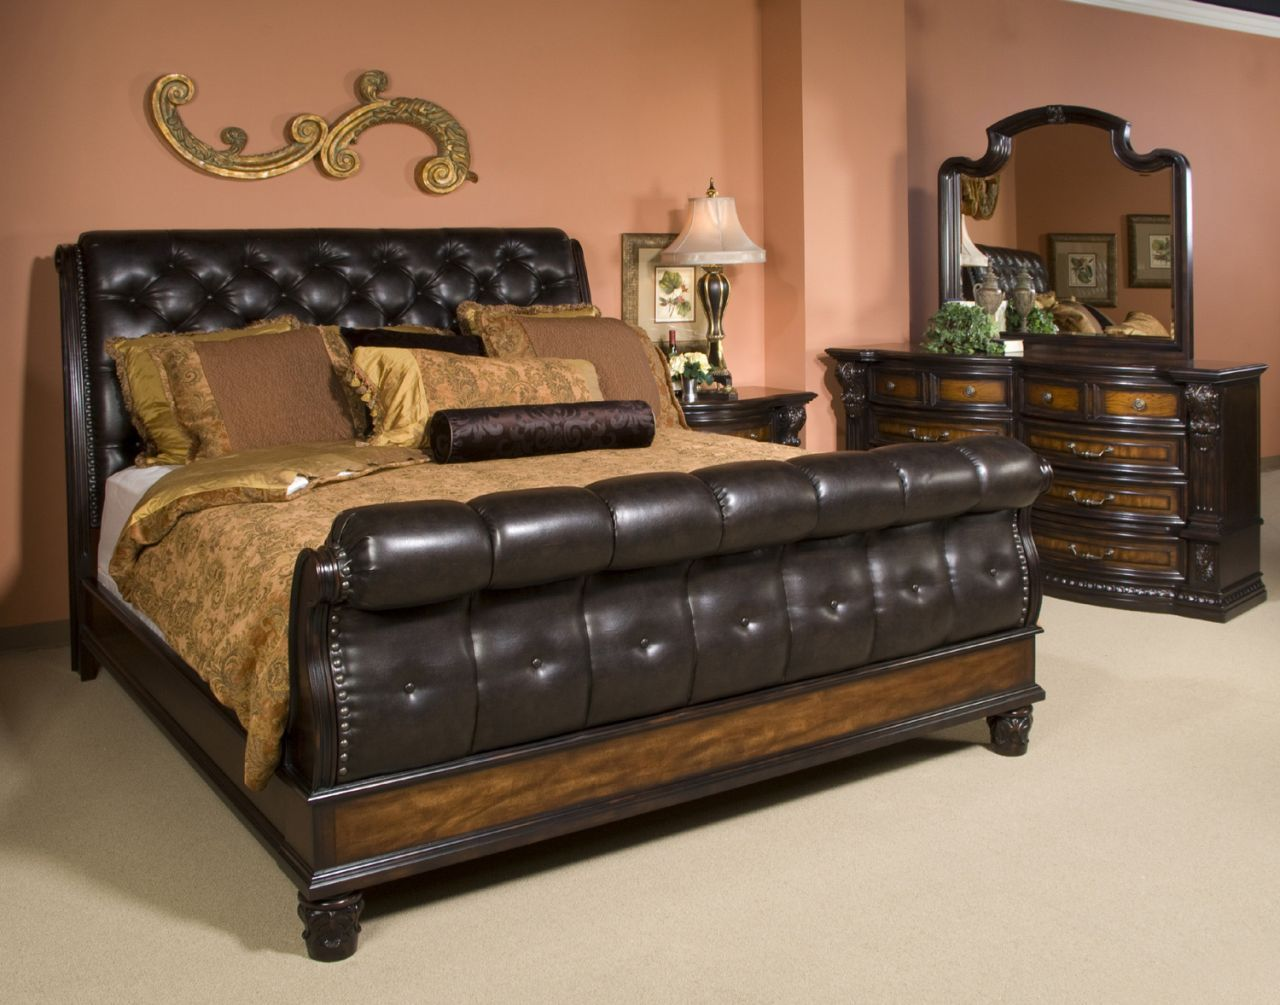 Fairmont Designs Bedroom Sets Fair Grand Estates Tufted Leather Sleigh Bed Queen Fairmont Designs Decorating Inspiration